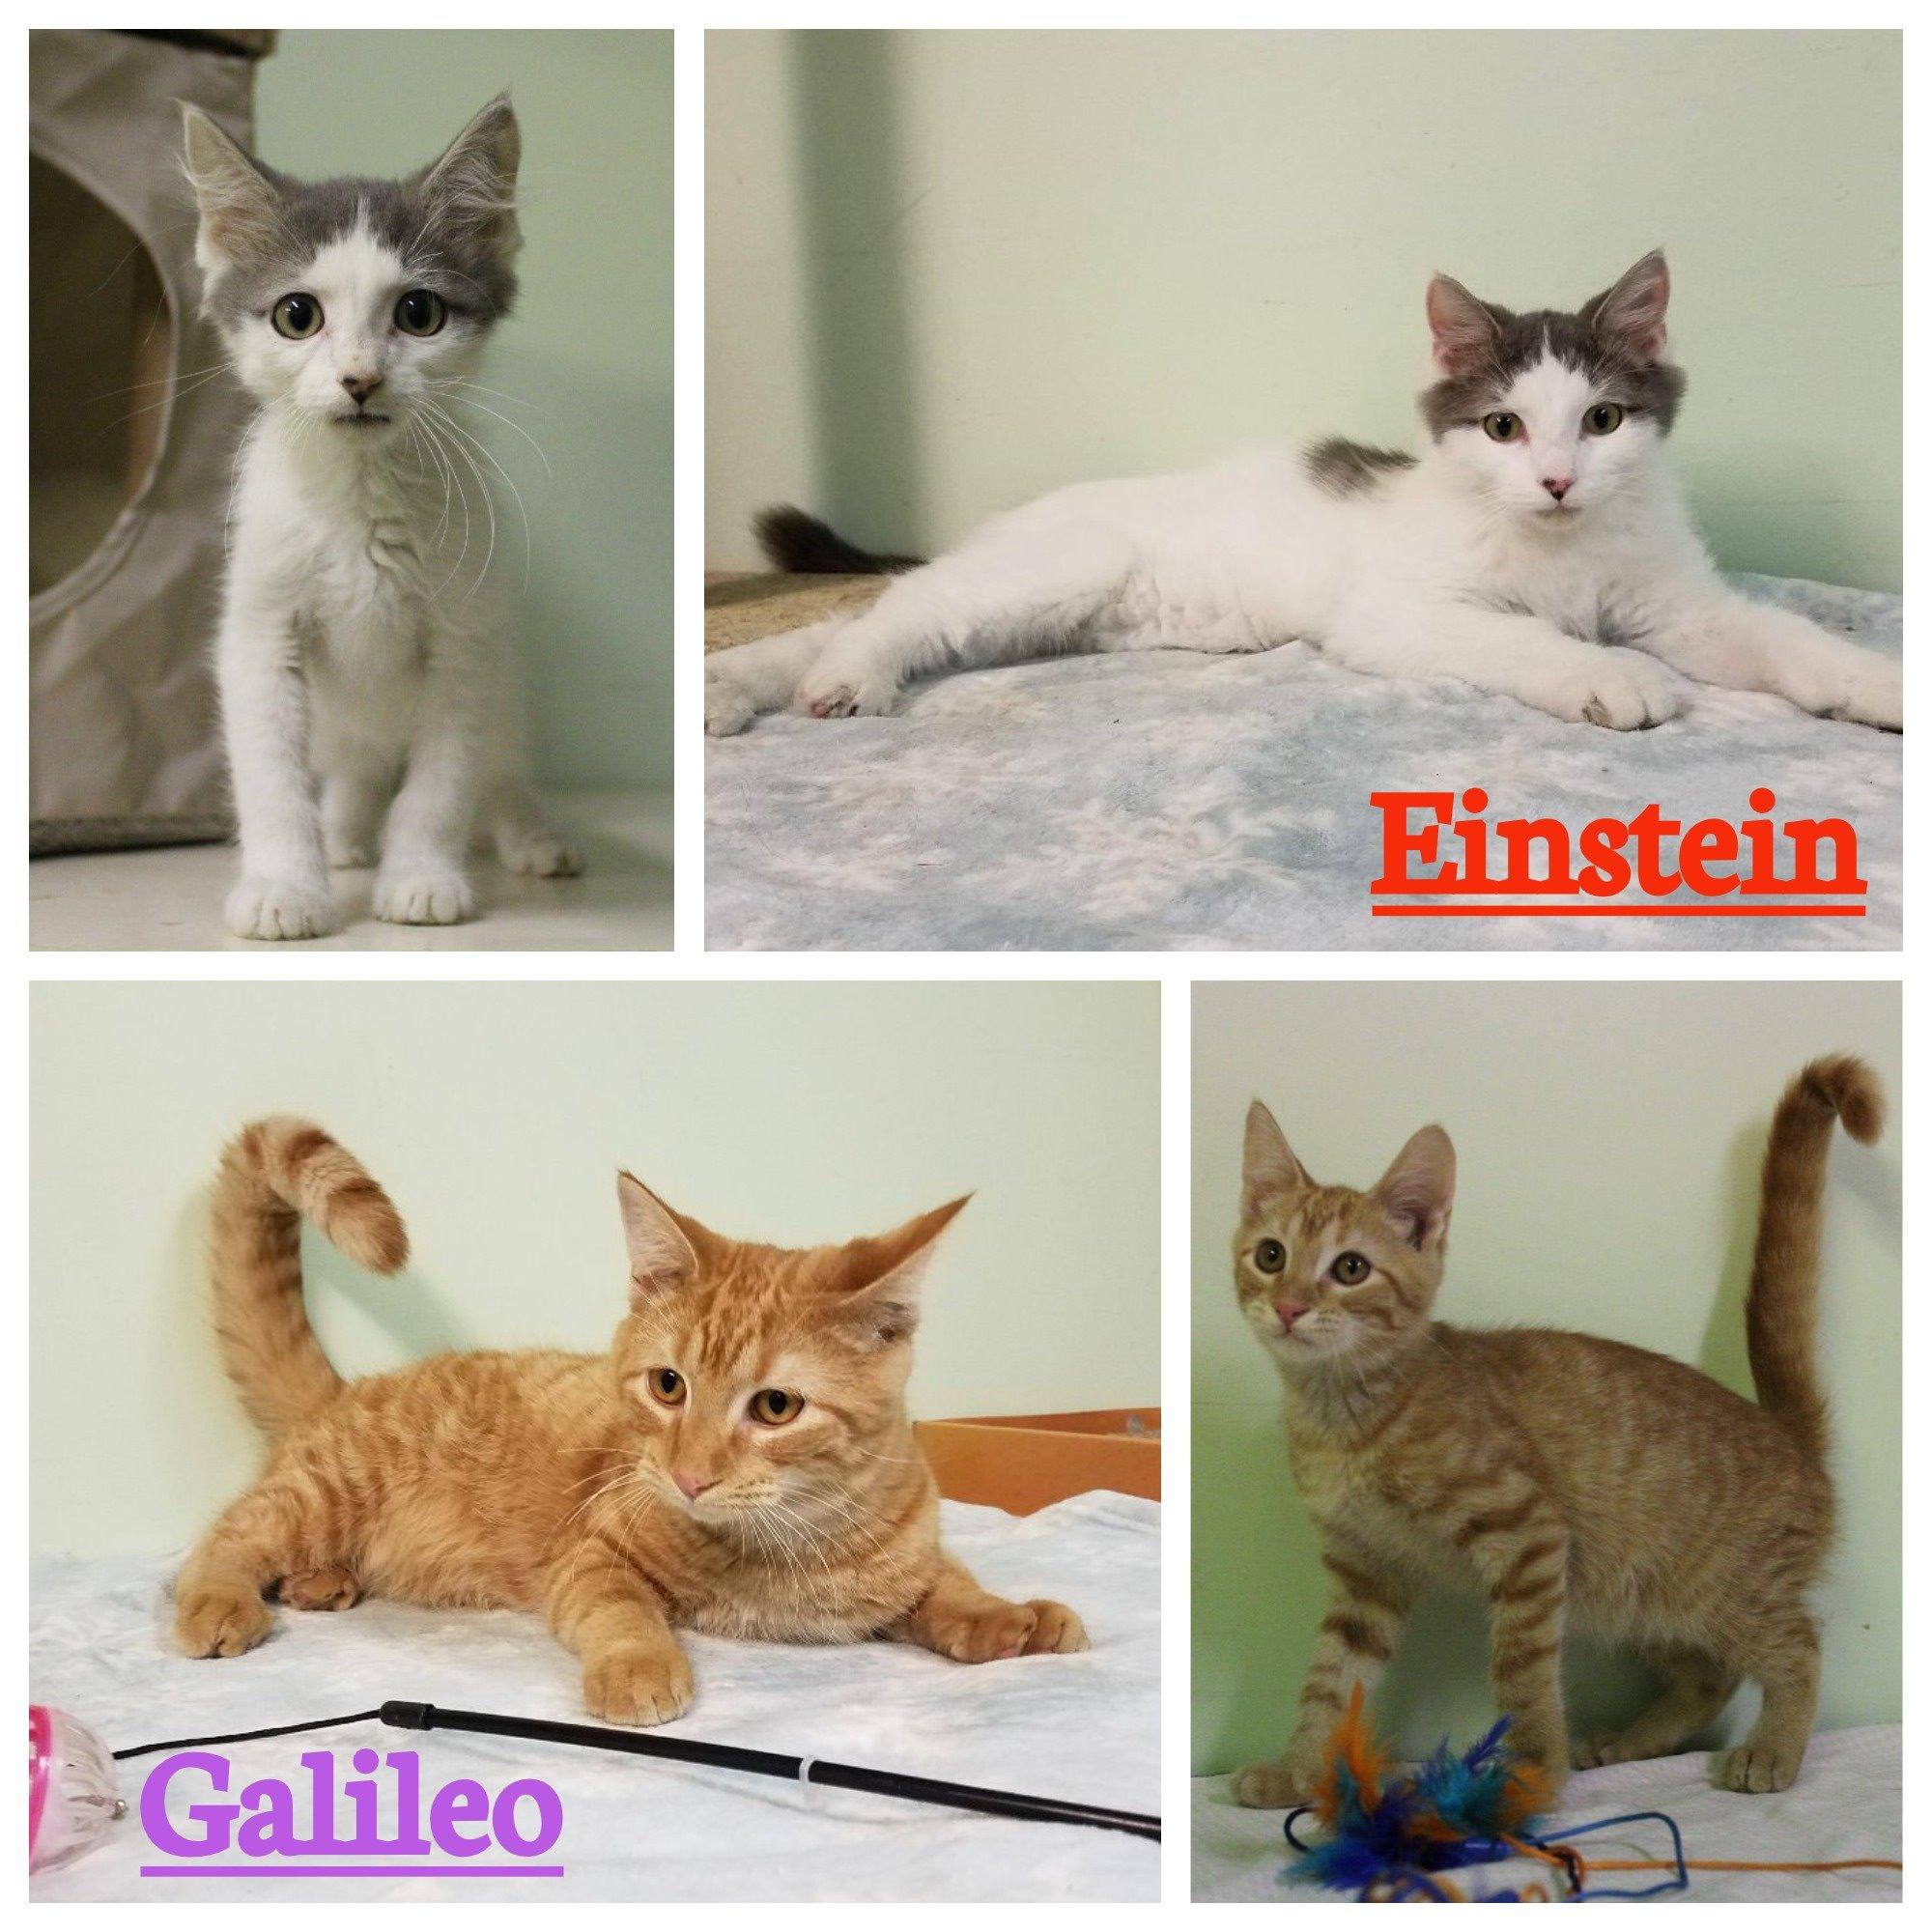 Einstein & Galileo, Humane Society of SI: (618) 457-2362